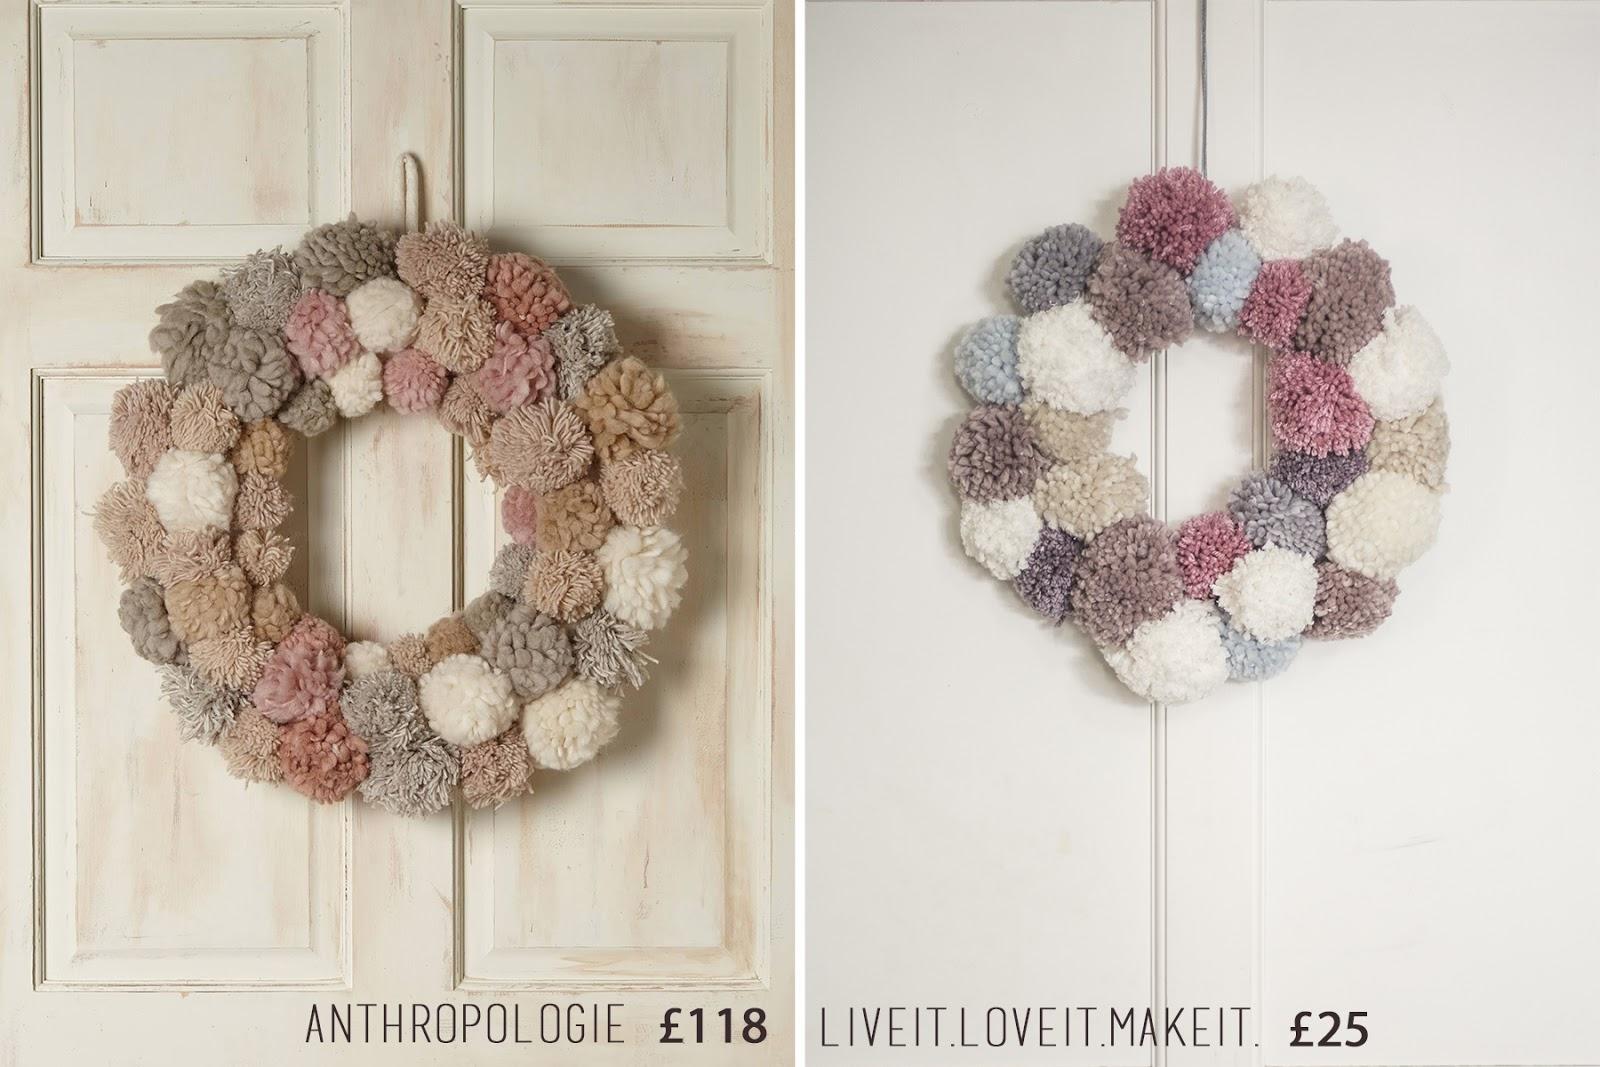 anthro-wreath1.jpg